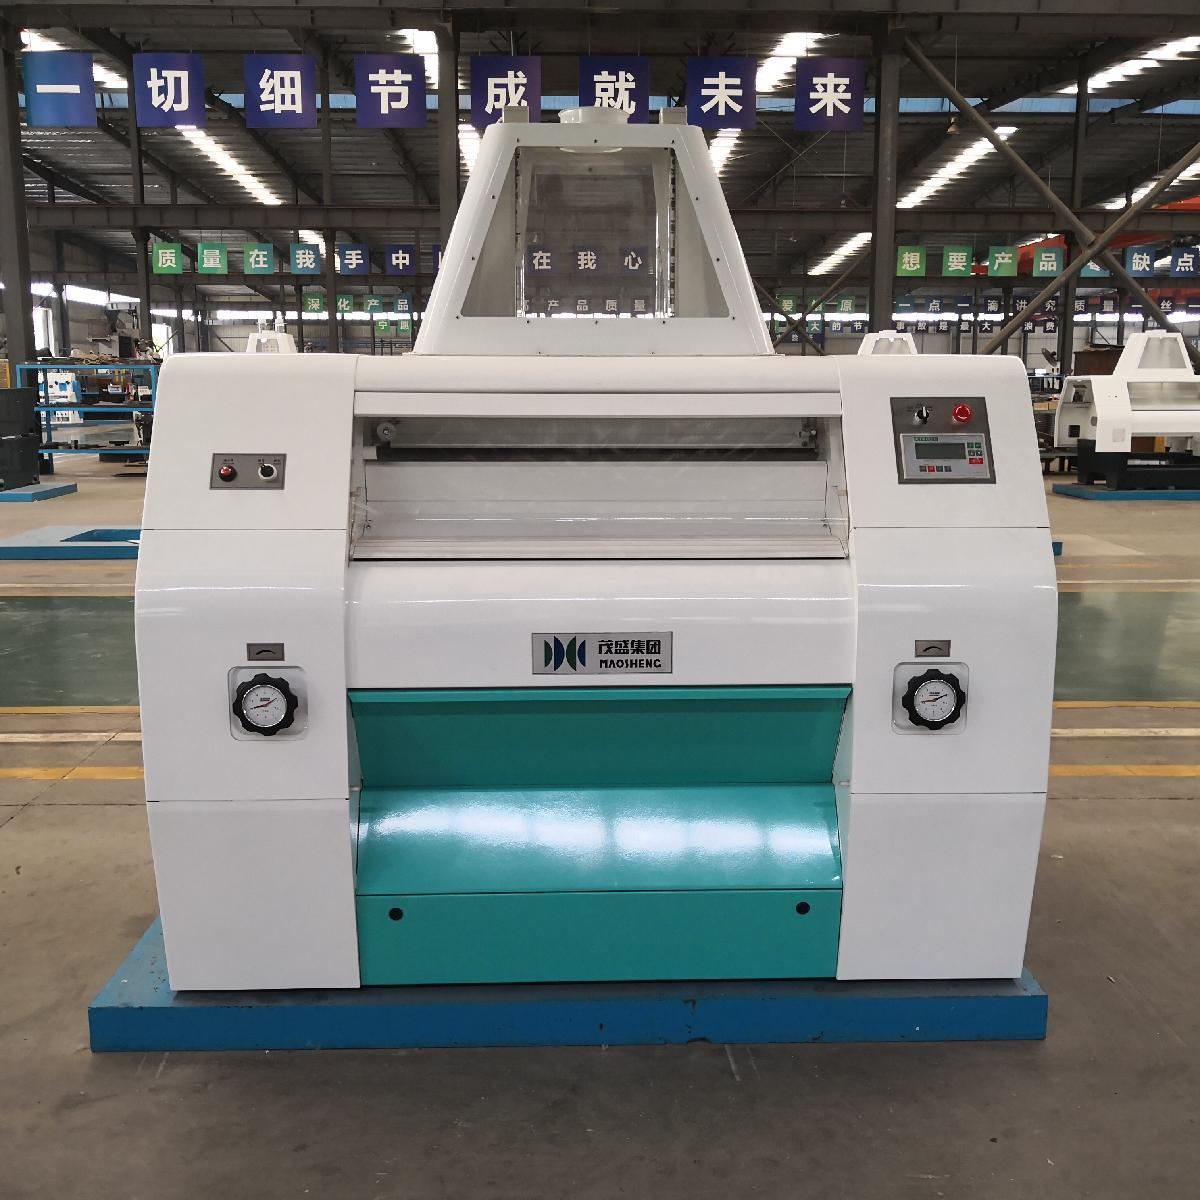 China supplier automatic wheat/corn/maize/teff  flour milling machine